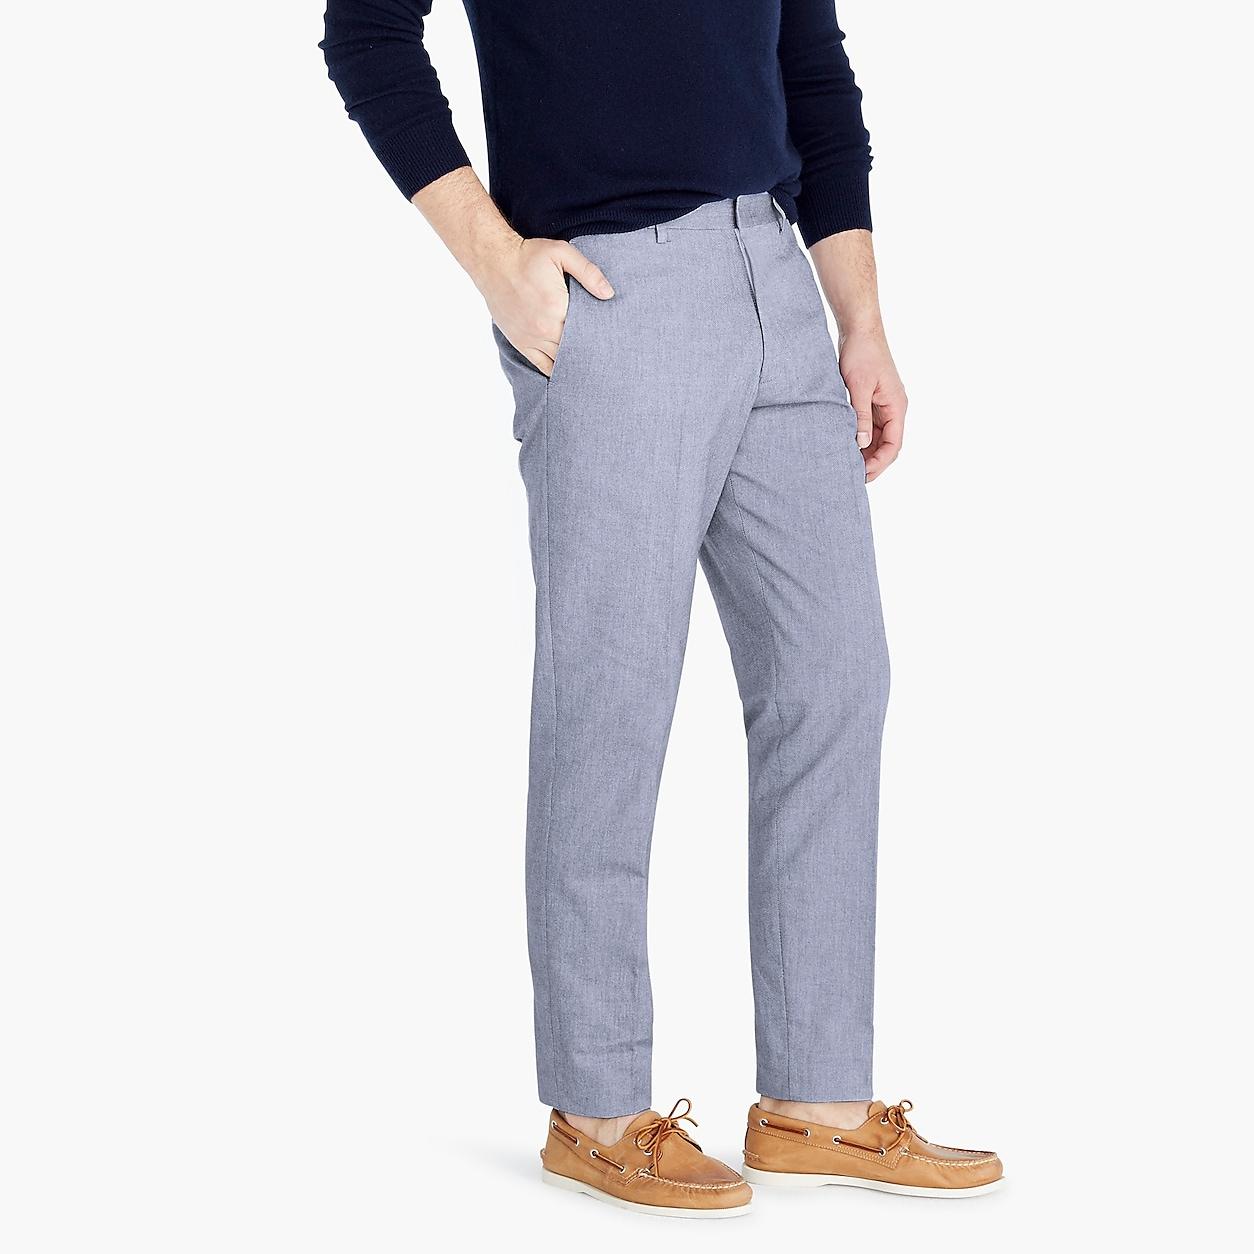 715393e94e56 Ludlow Classic-Fit Suit Pant In Union Blue Italian Cotton Oxford in ...